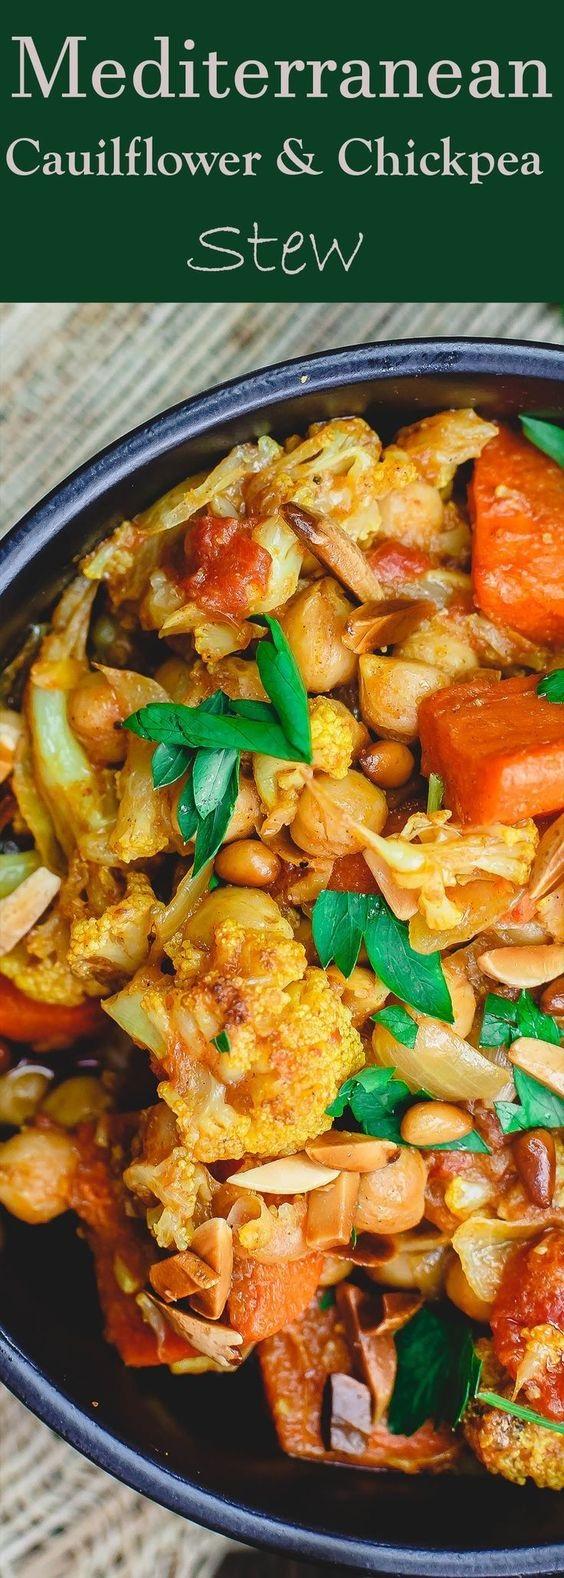 Turmeric Roasted Cauliflower And Chickpea Stew